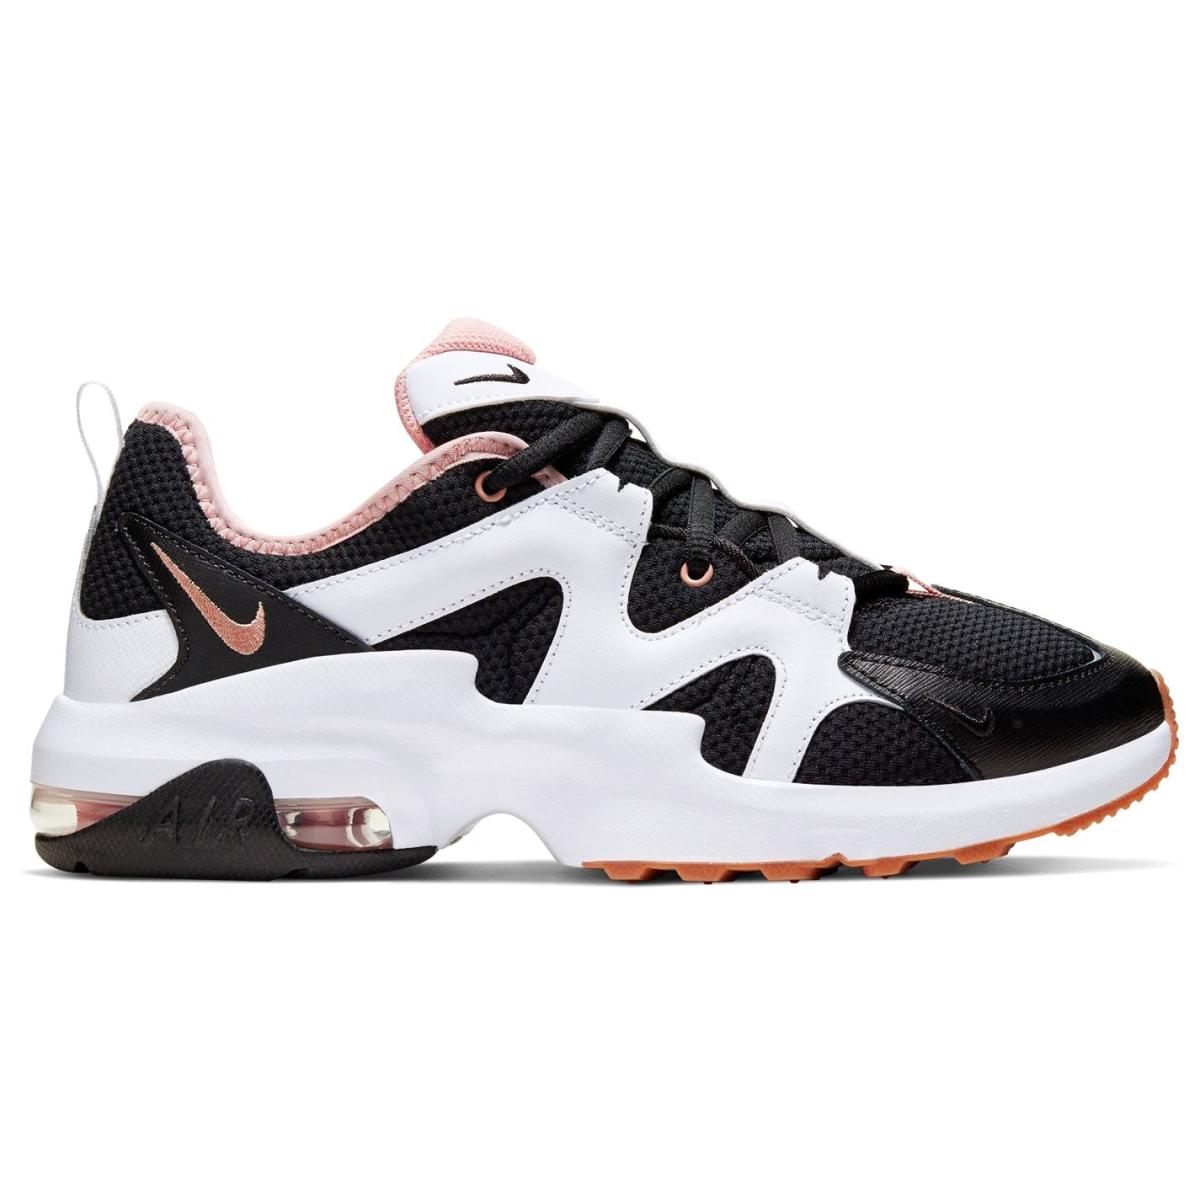 Nike-Air-Max-Graviton-Turnschuhe-Damen-Sneaker-Sportschuhe-Laufschuhe-4069 Indexbild 3